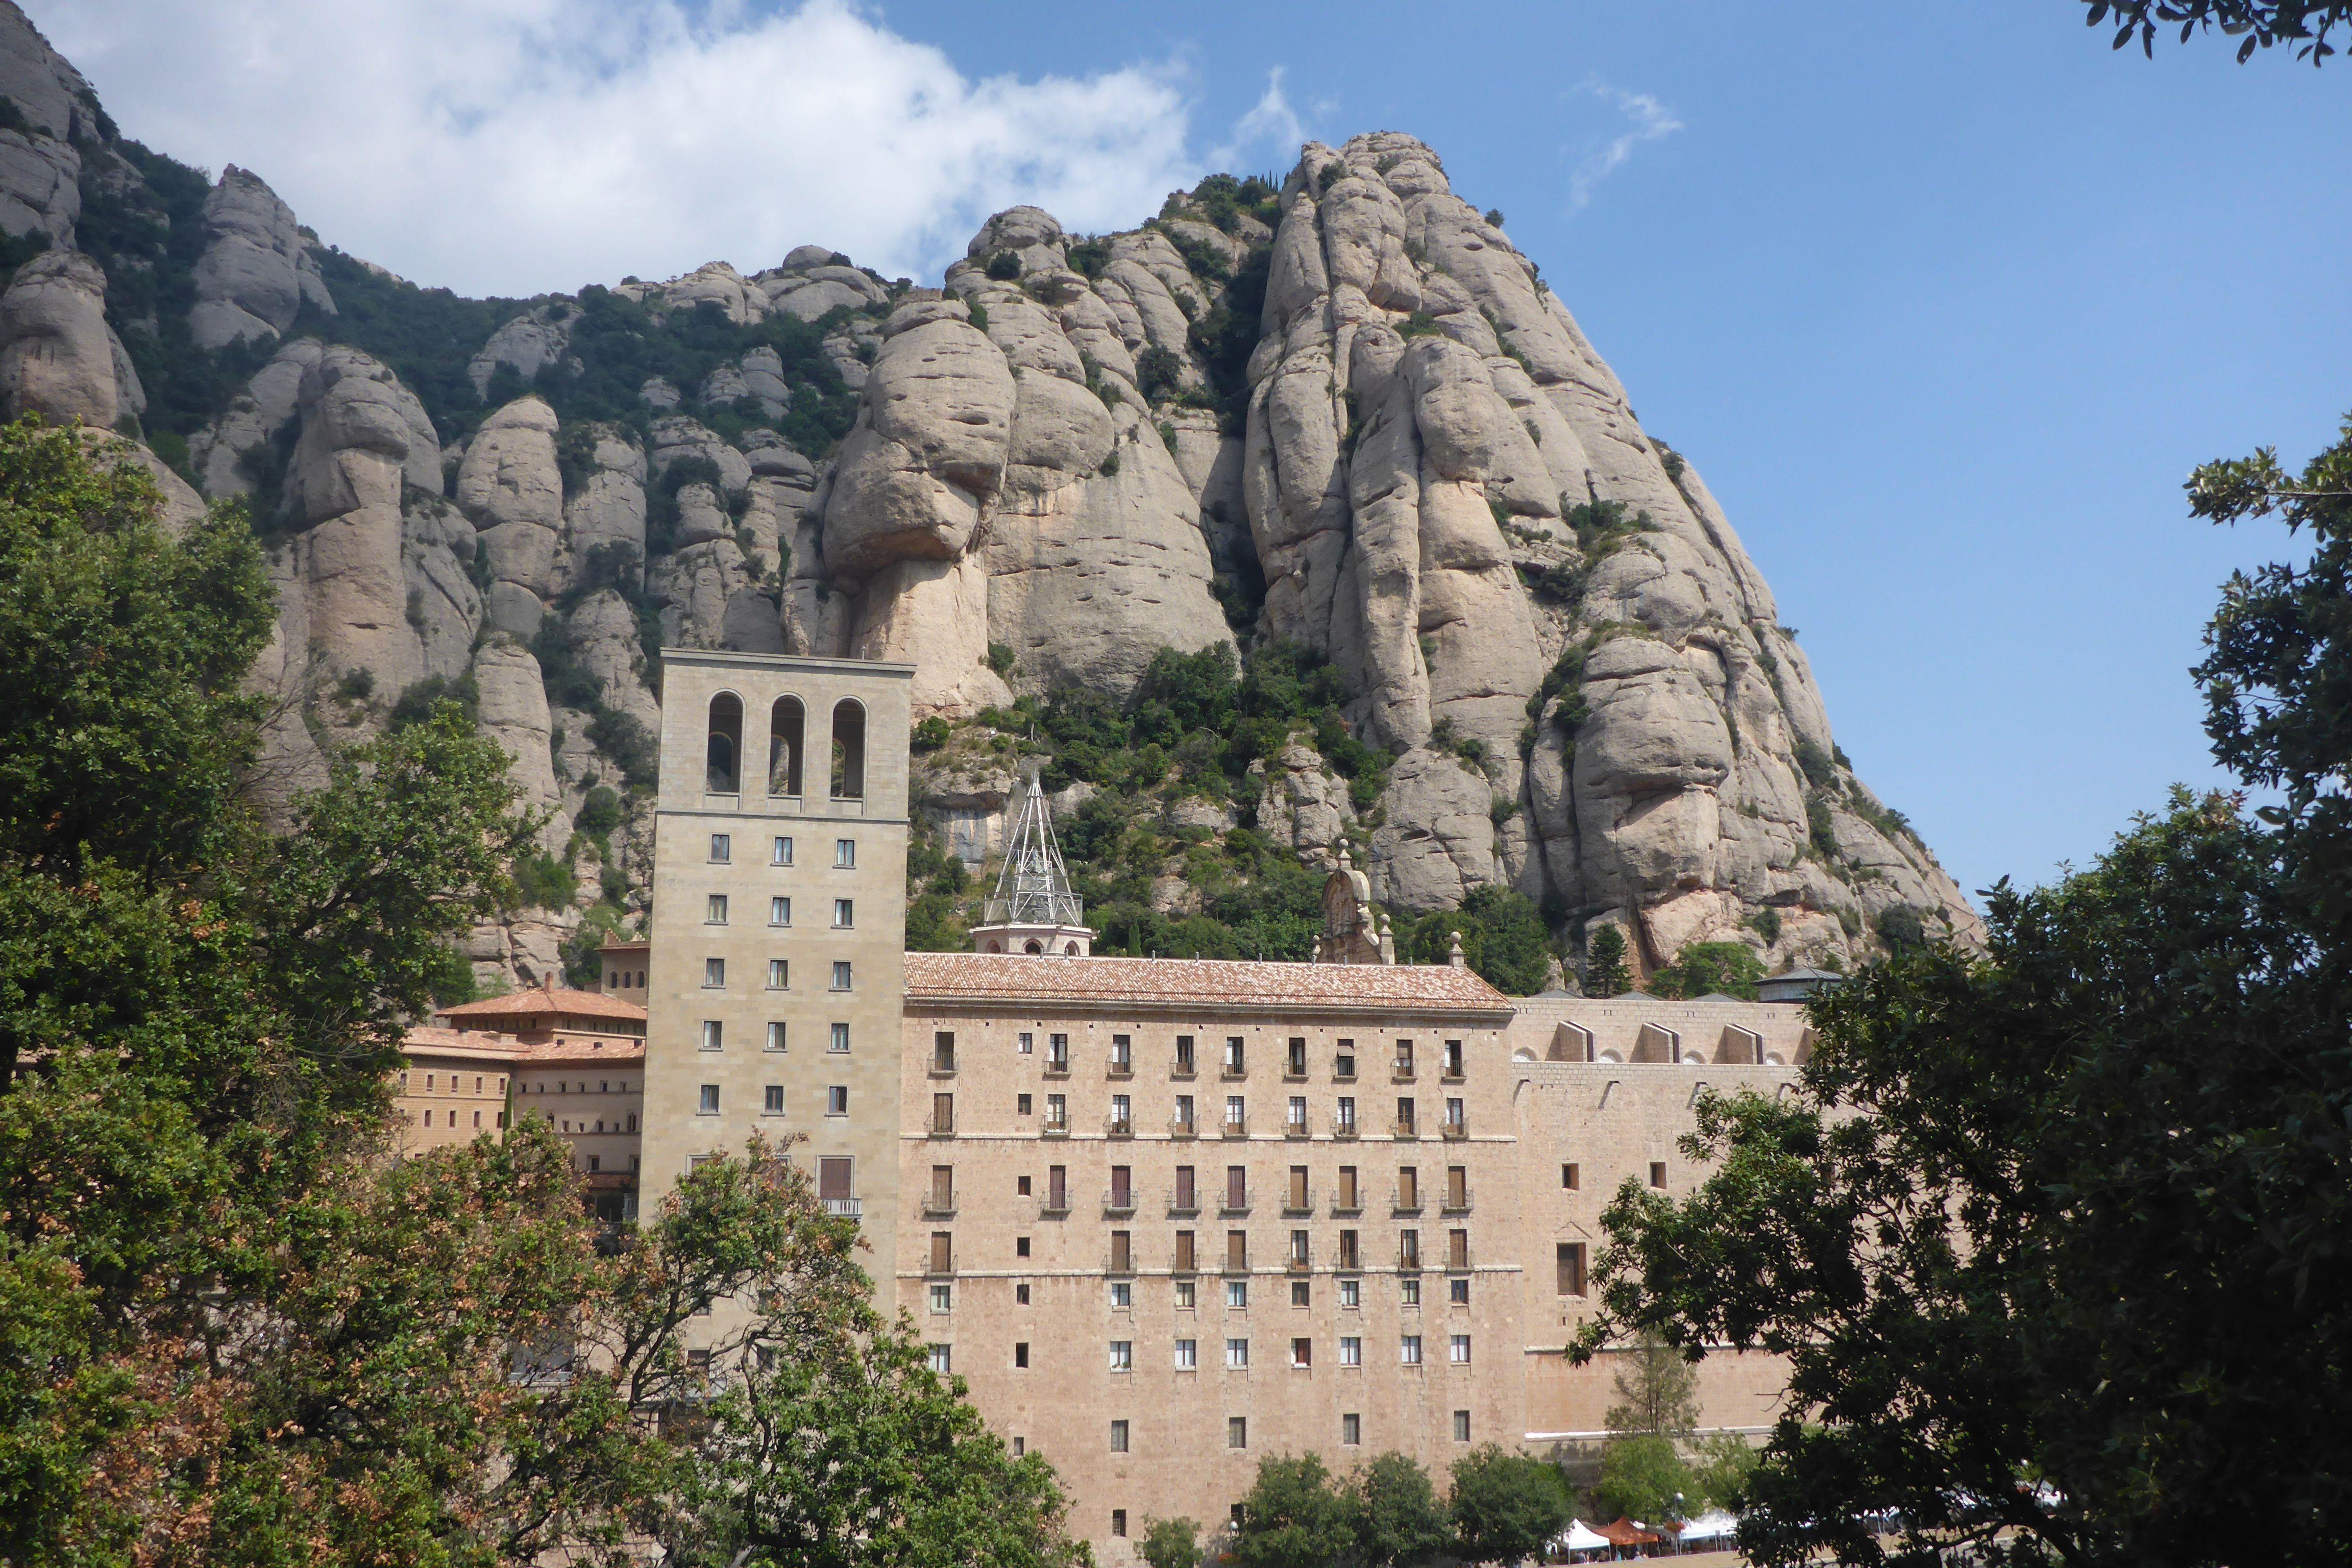 Monastery at Montserrat near Barcelona